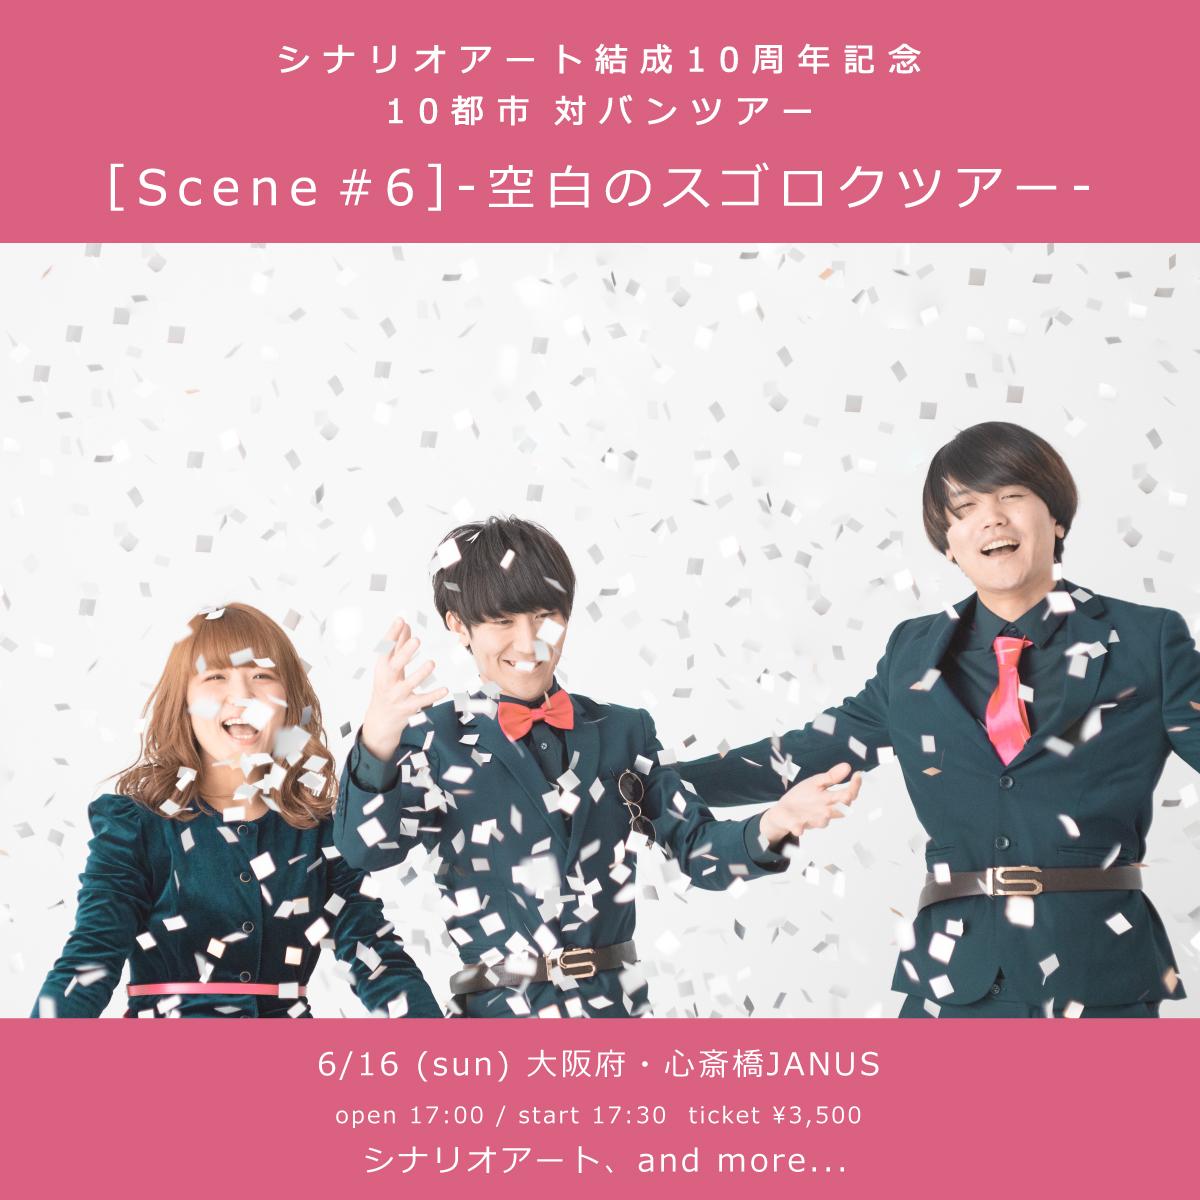 [Scene #6]-空白のスゴロクツアー- 《大阪公演》